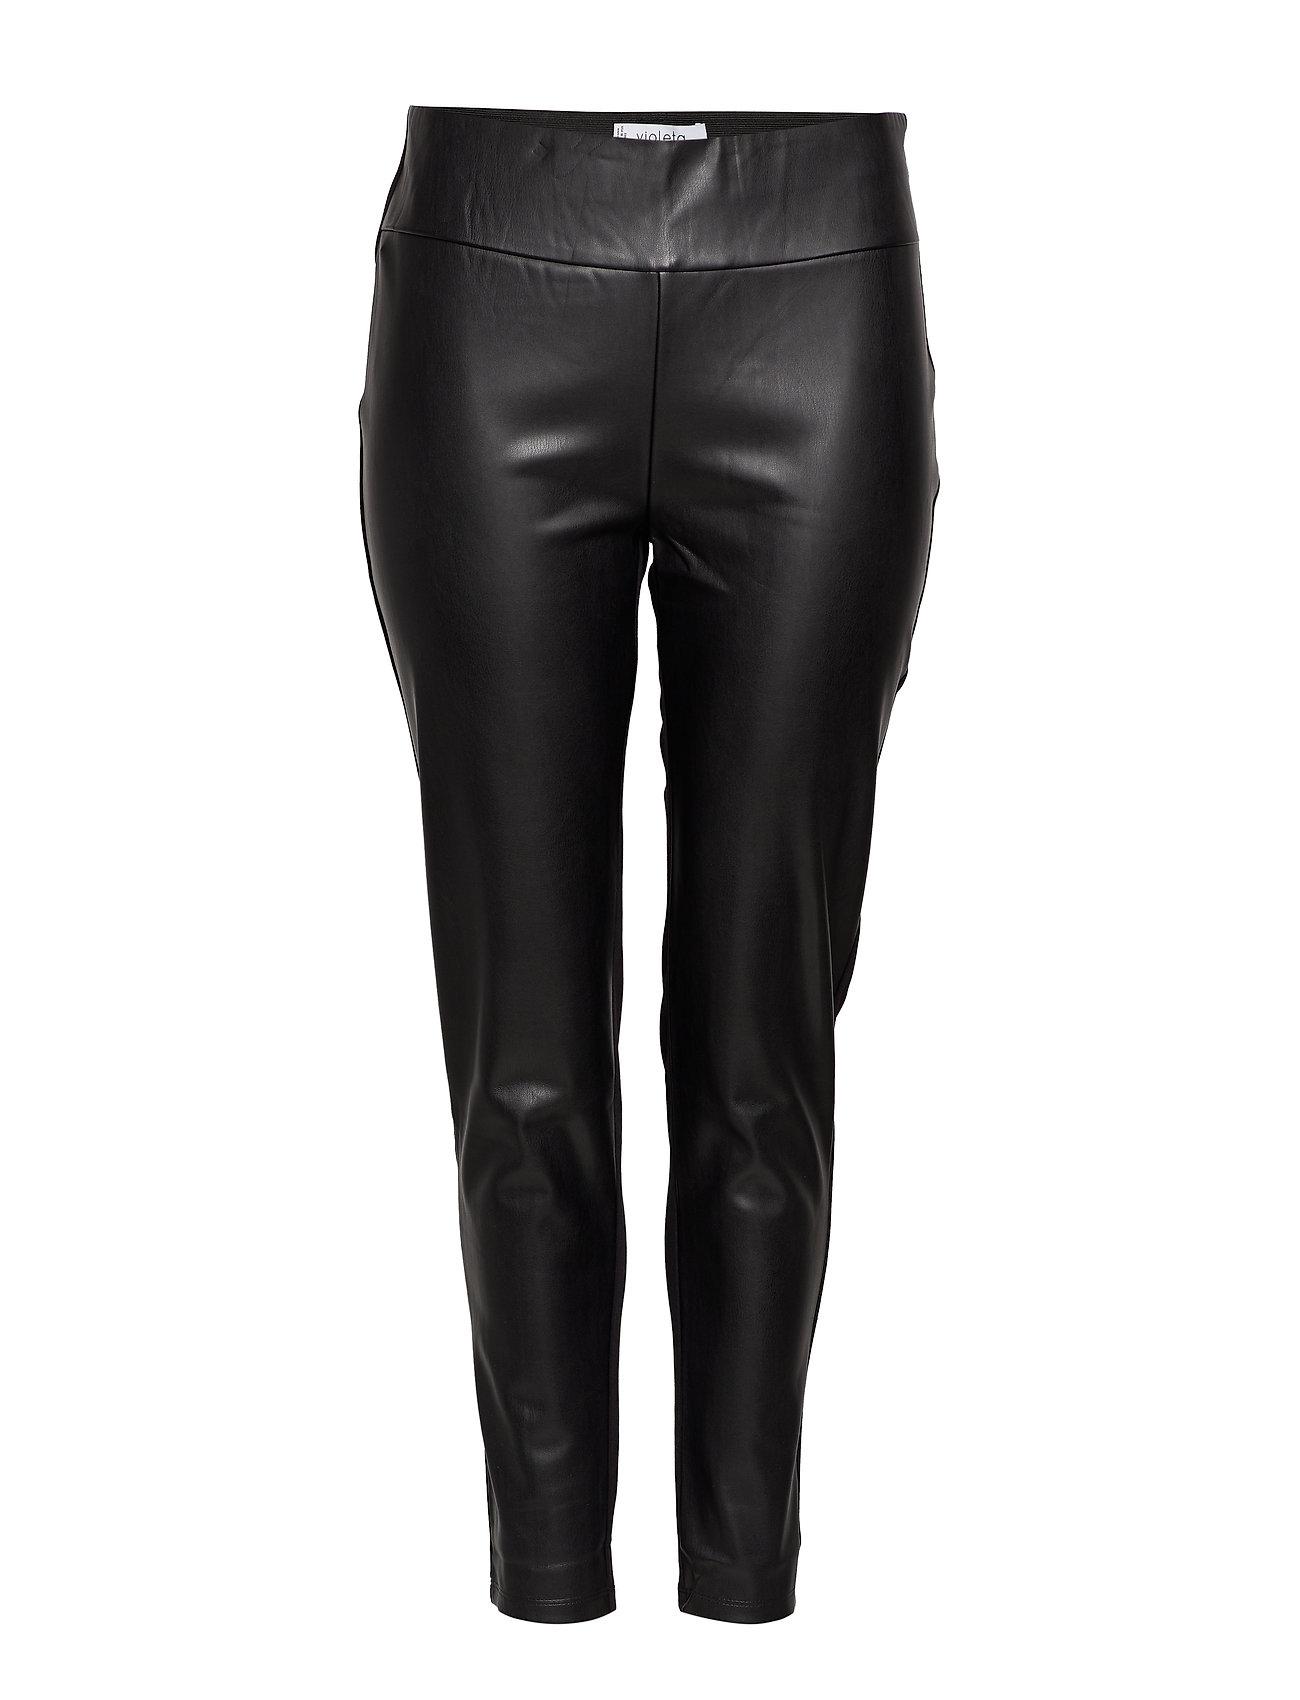 Violeta by Mango Faux leather leggings - BLACK